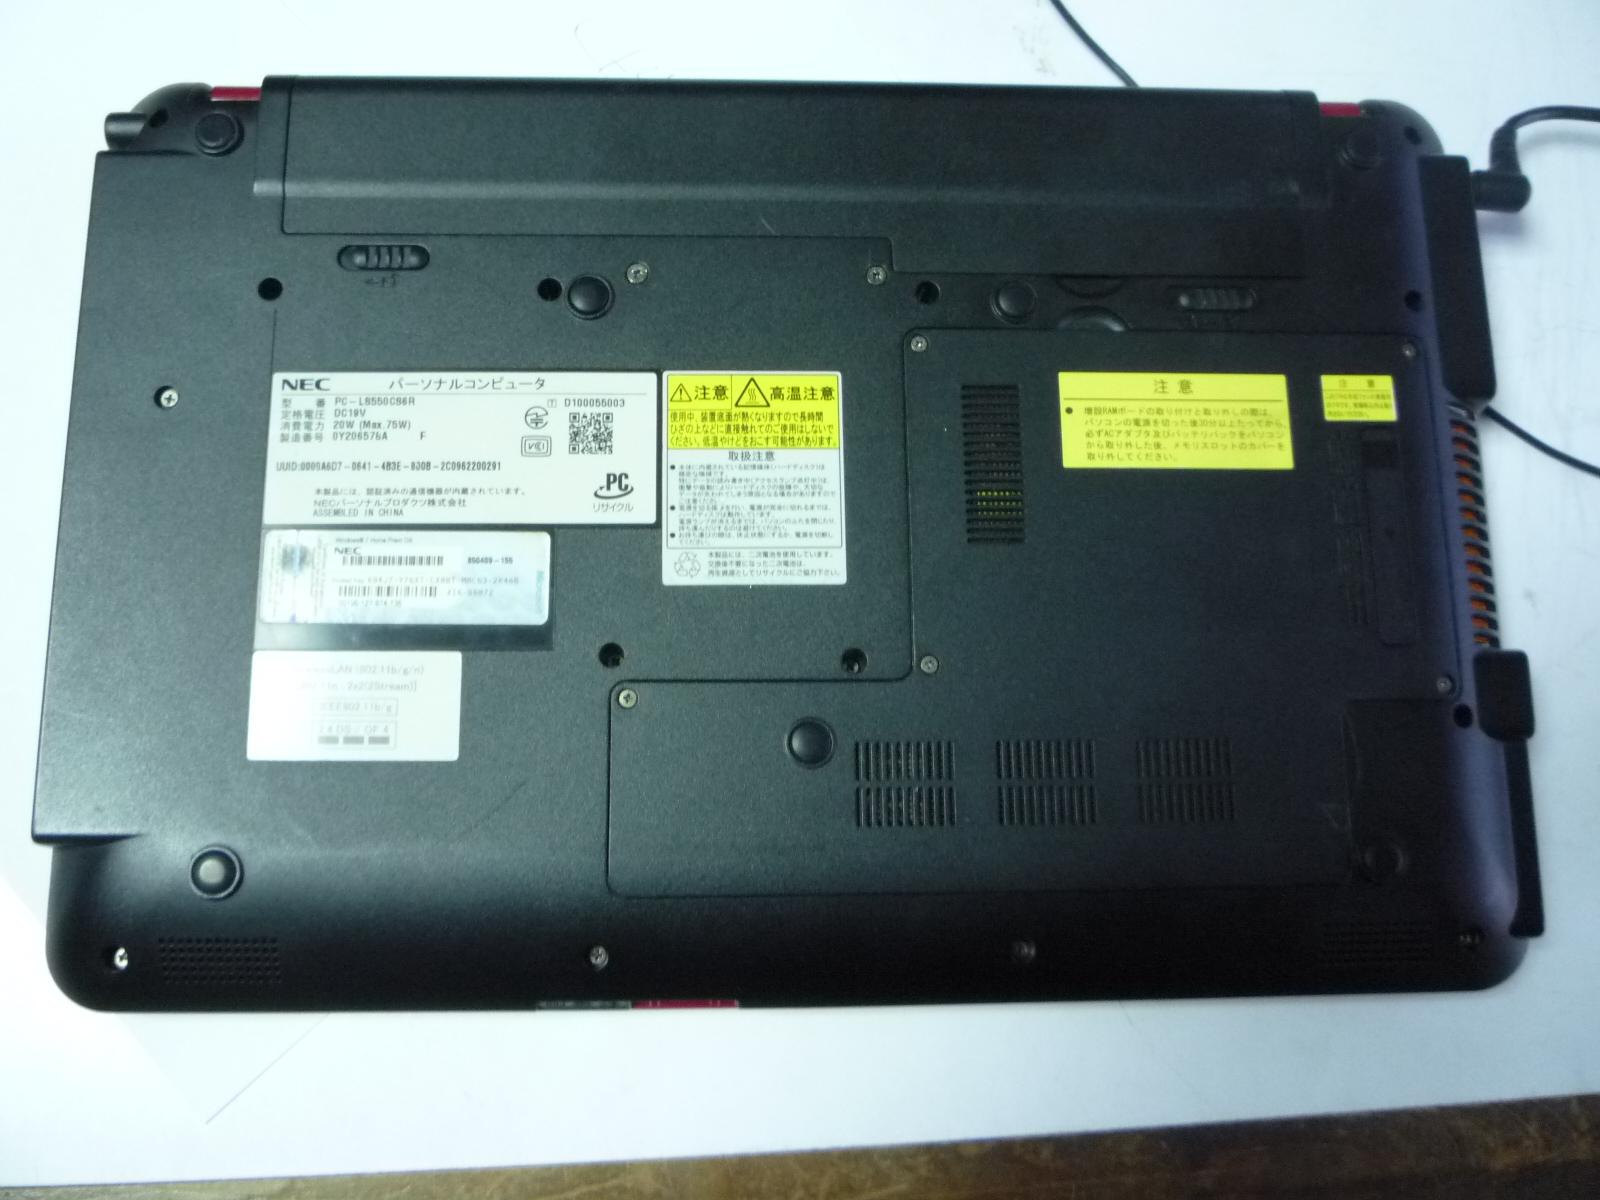 NEC Lavie LS550/Cが起動しなくなりました